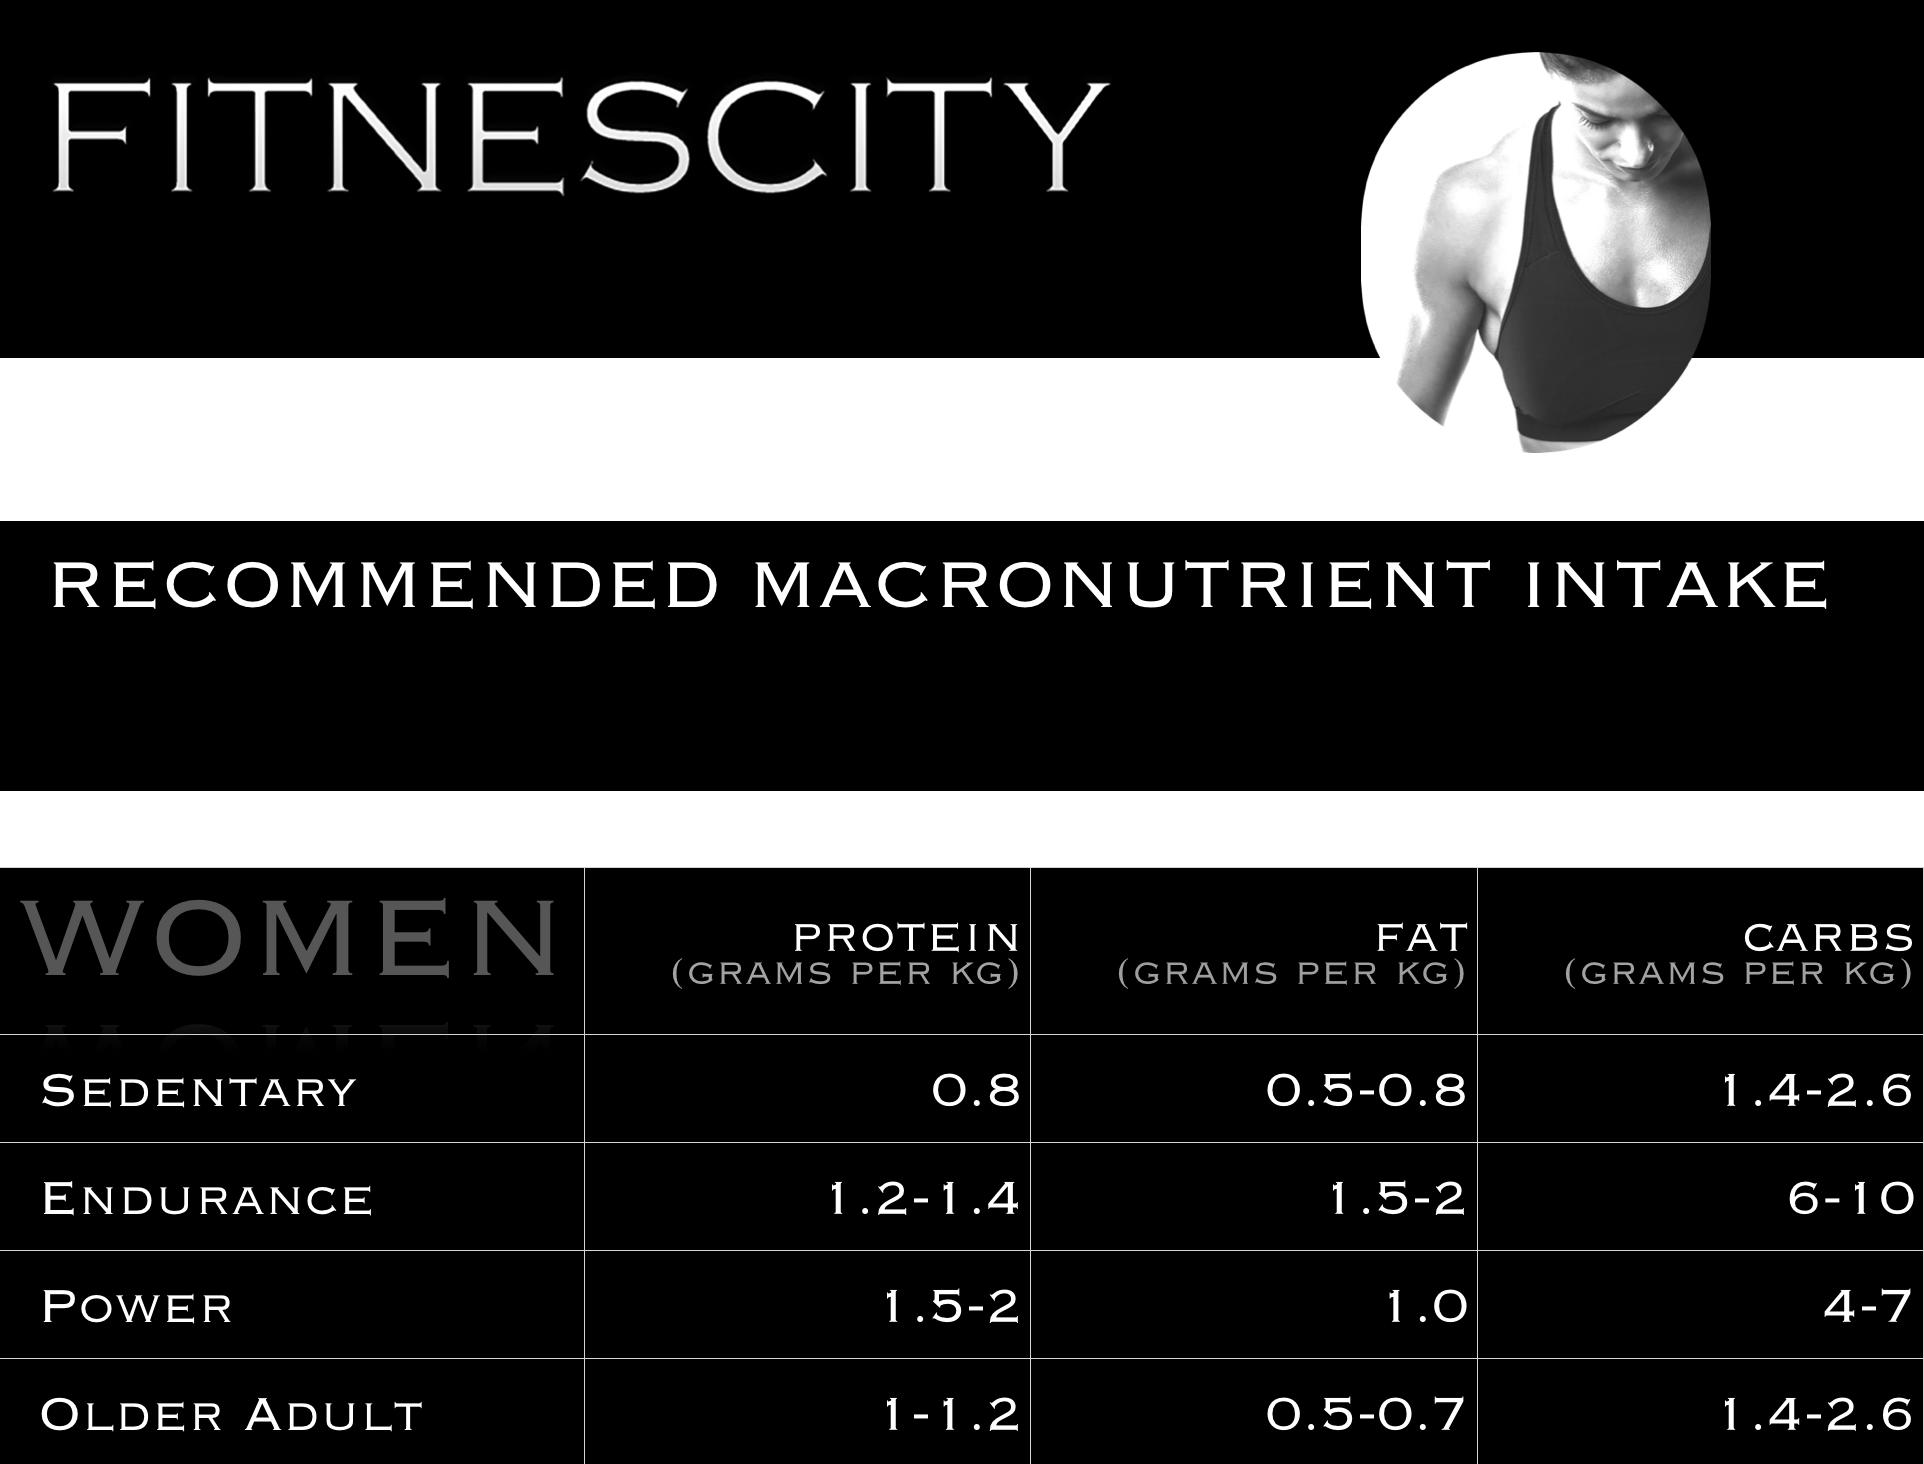 Macronutrients - women.png